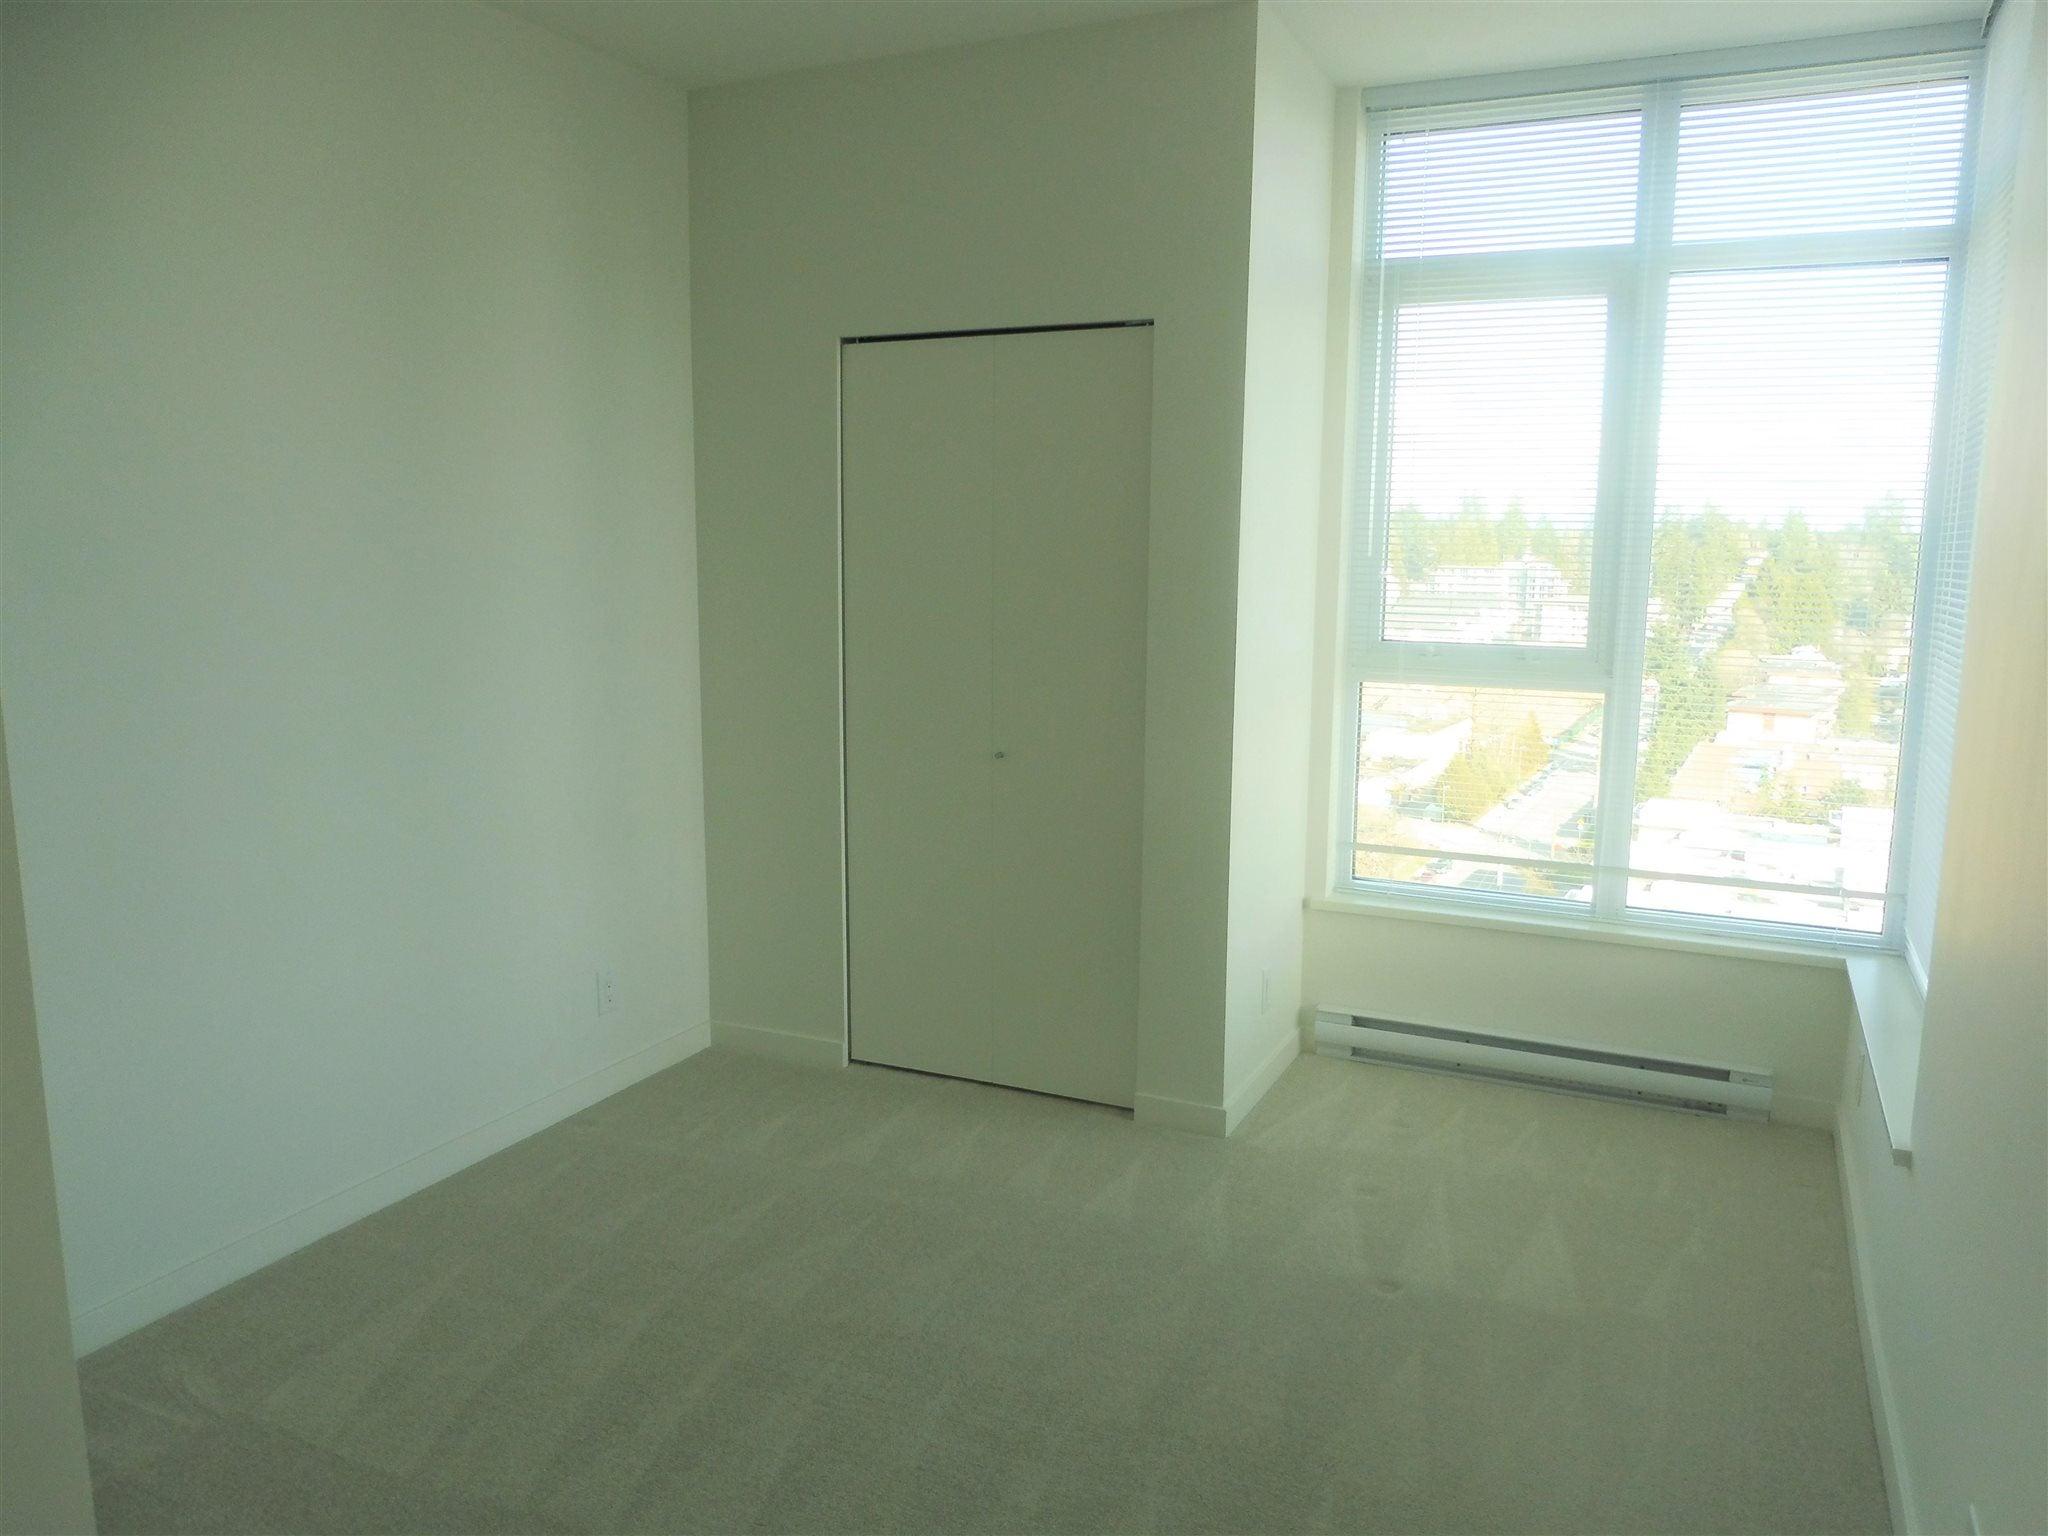 1409 691 NORTH ROAD - Coquitlam West Apartment/Condo for sale, 2 Bedrooms (R2604155) - #9